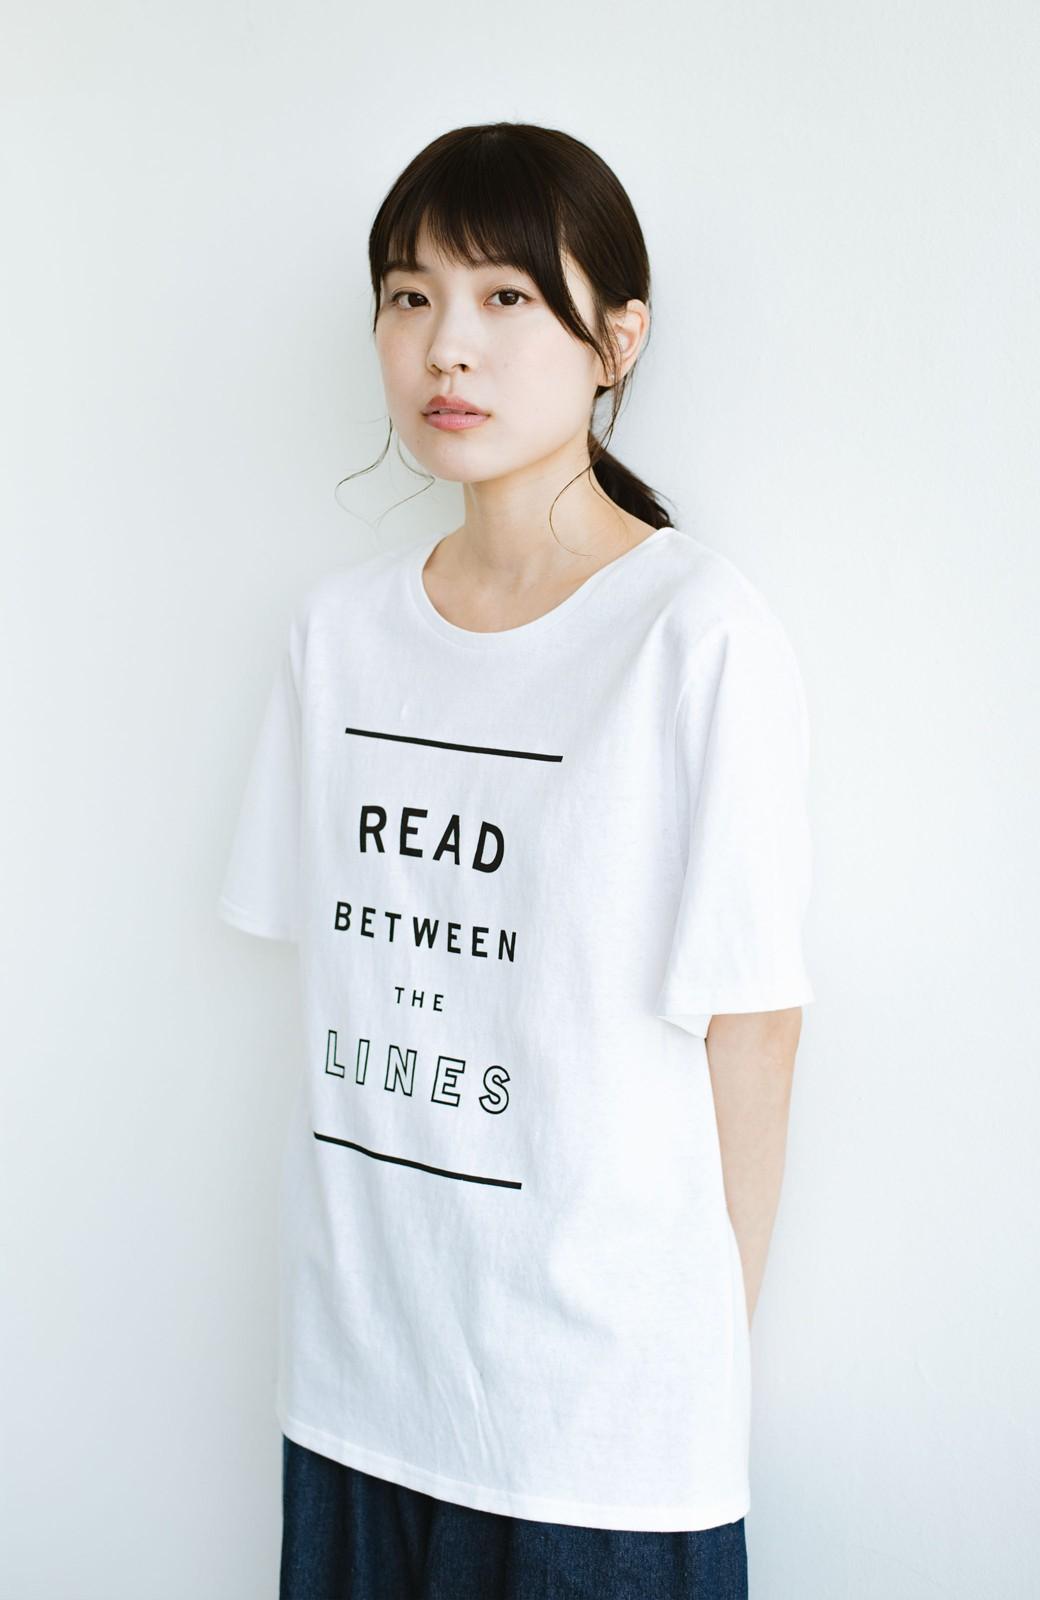 haco! 女の子バンザイ!プロジェクト【毎日いろいろあるのよ】PBPオーガニックコットンの女子の気持ちを察してほしいよTシャツ <ホワイト>の商品写真8